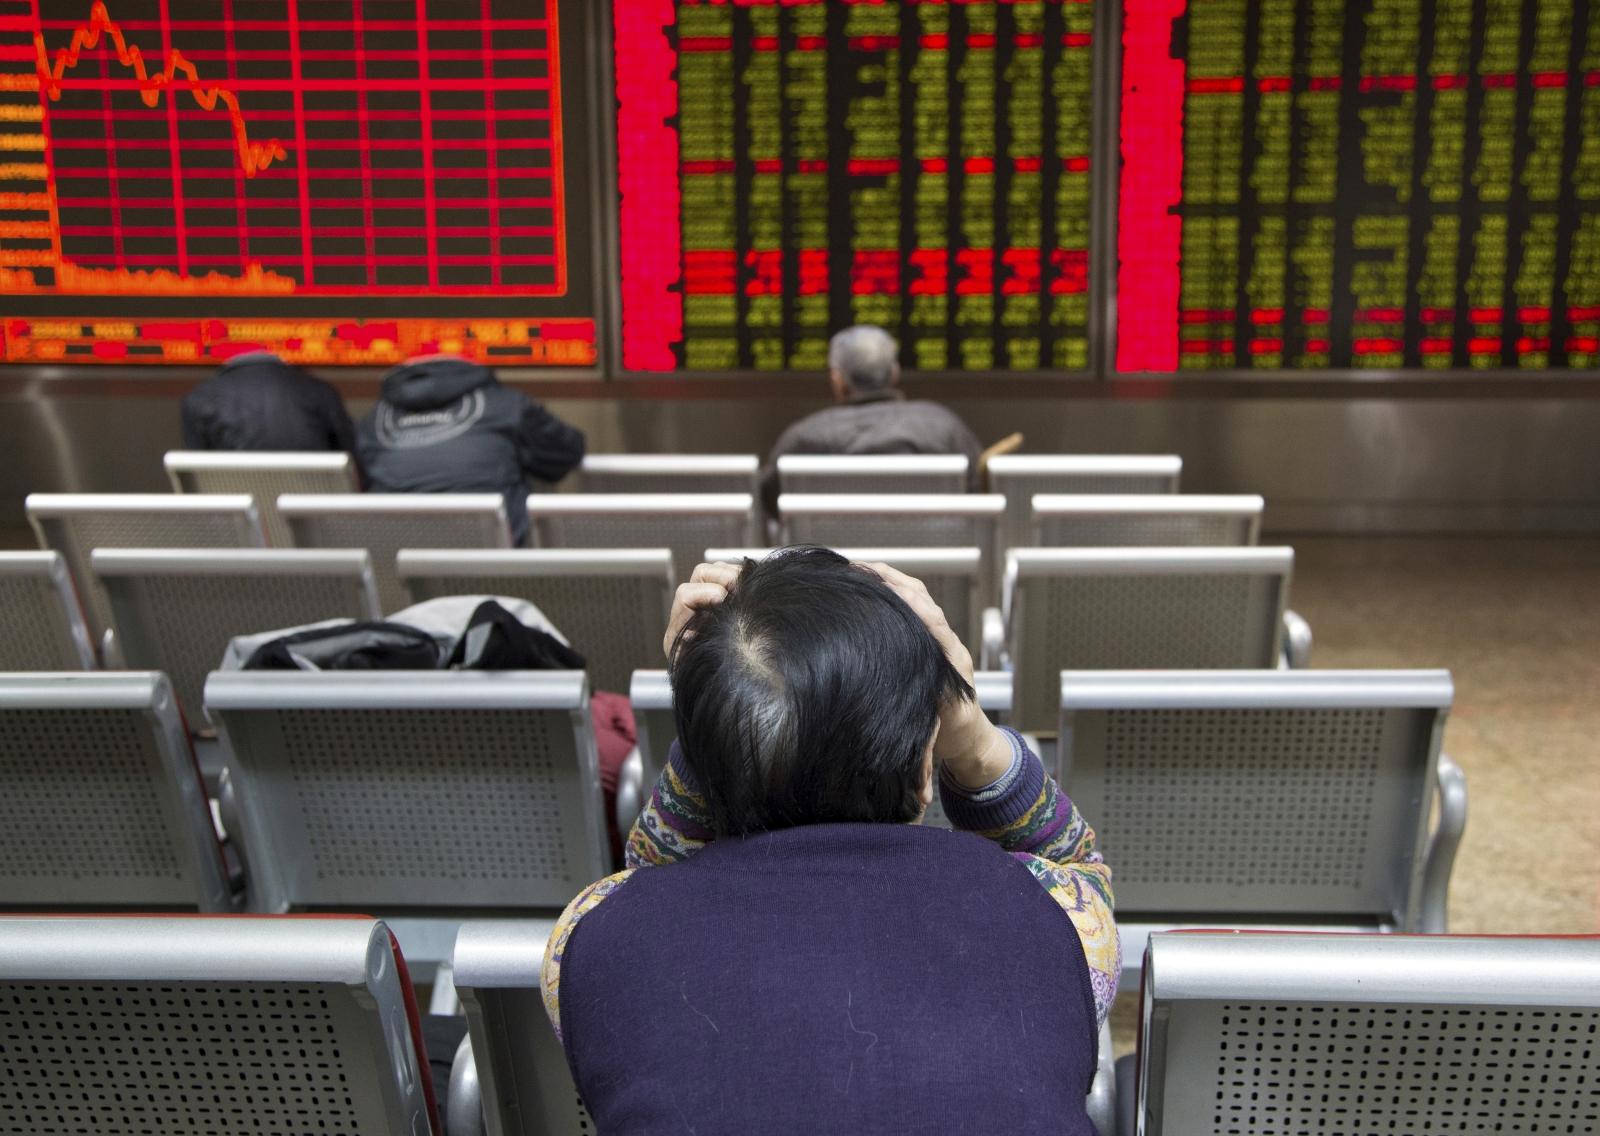 Asian markets: Shanghai Composite slips amid caution ahead of US June non-farm payrolls data